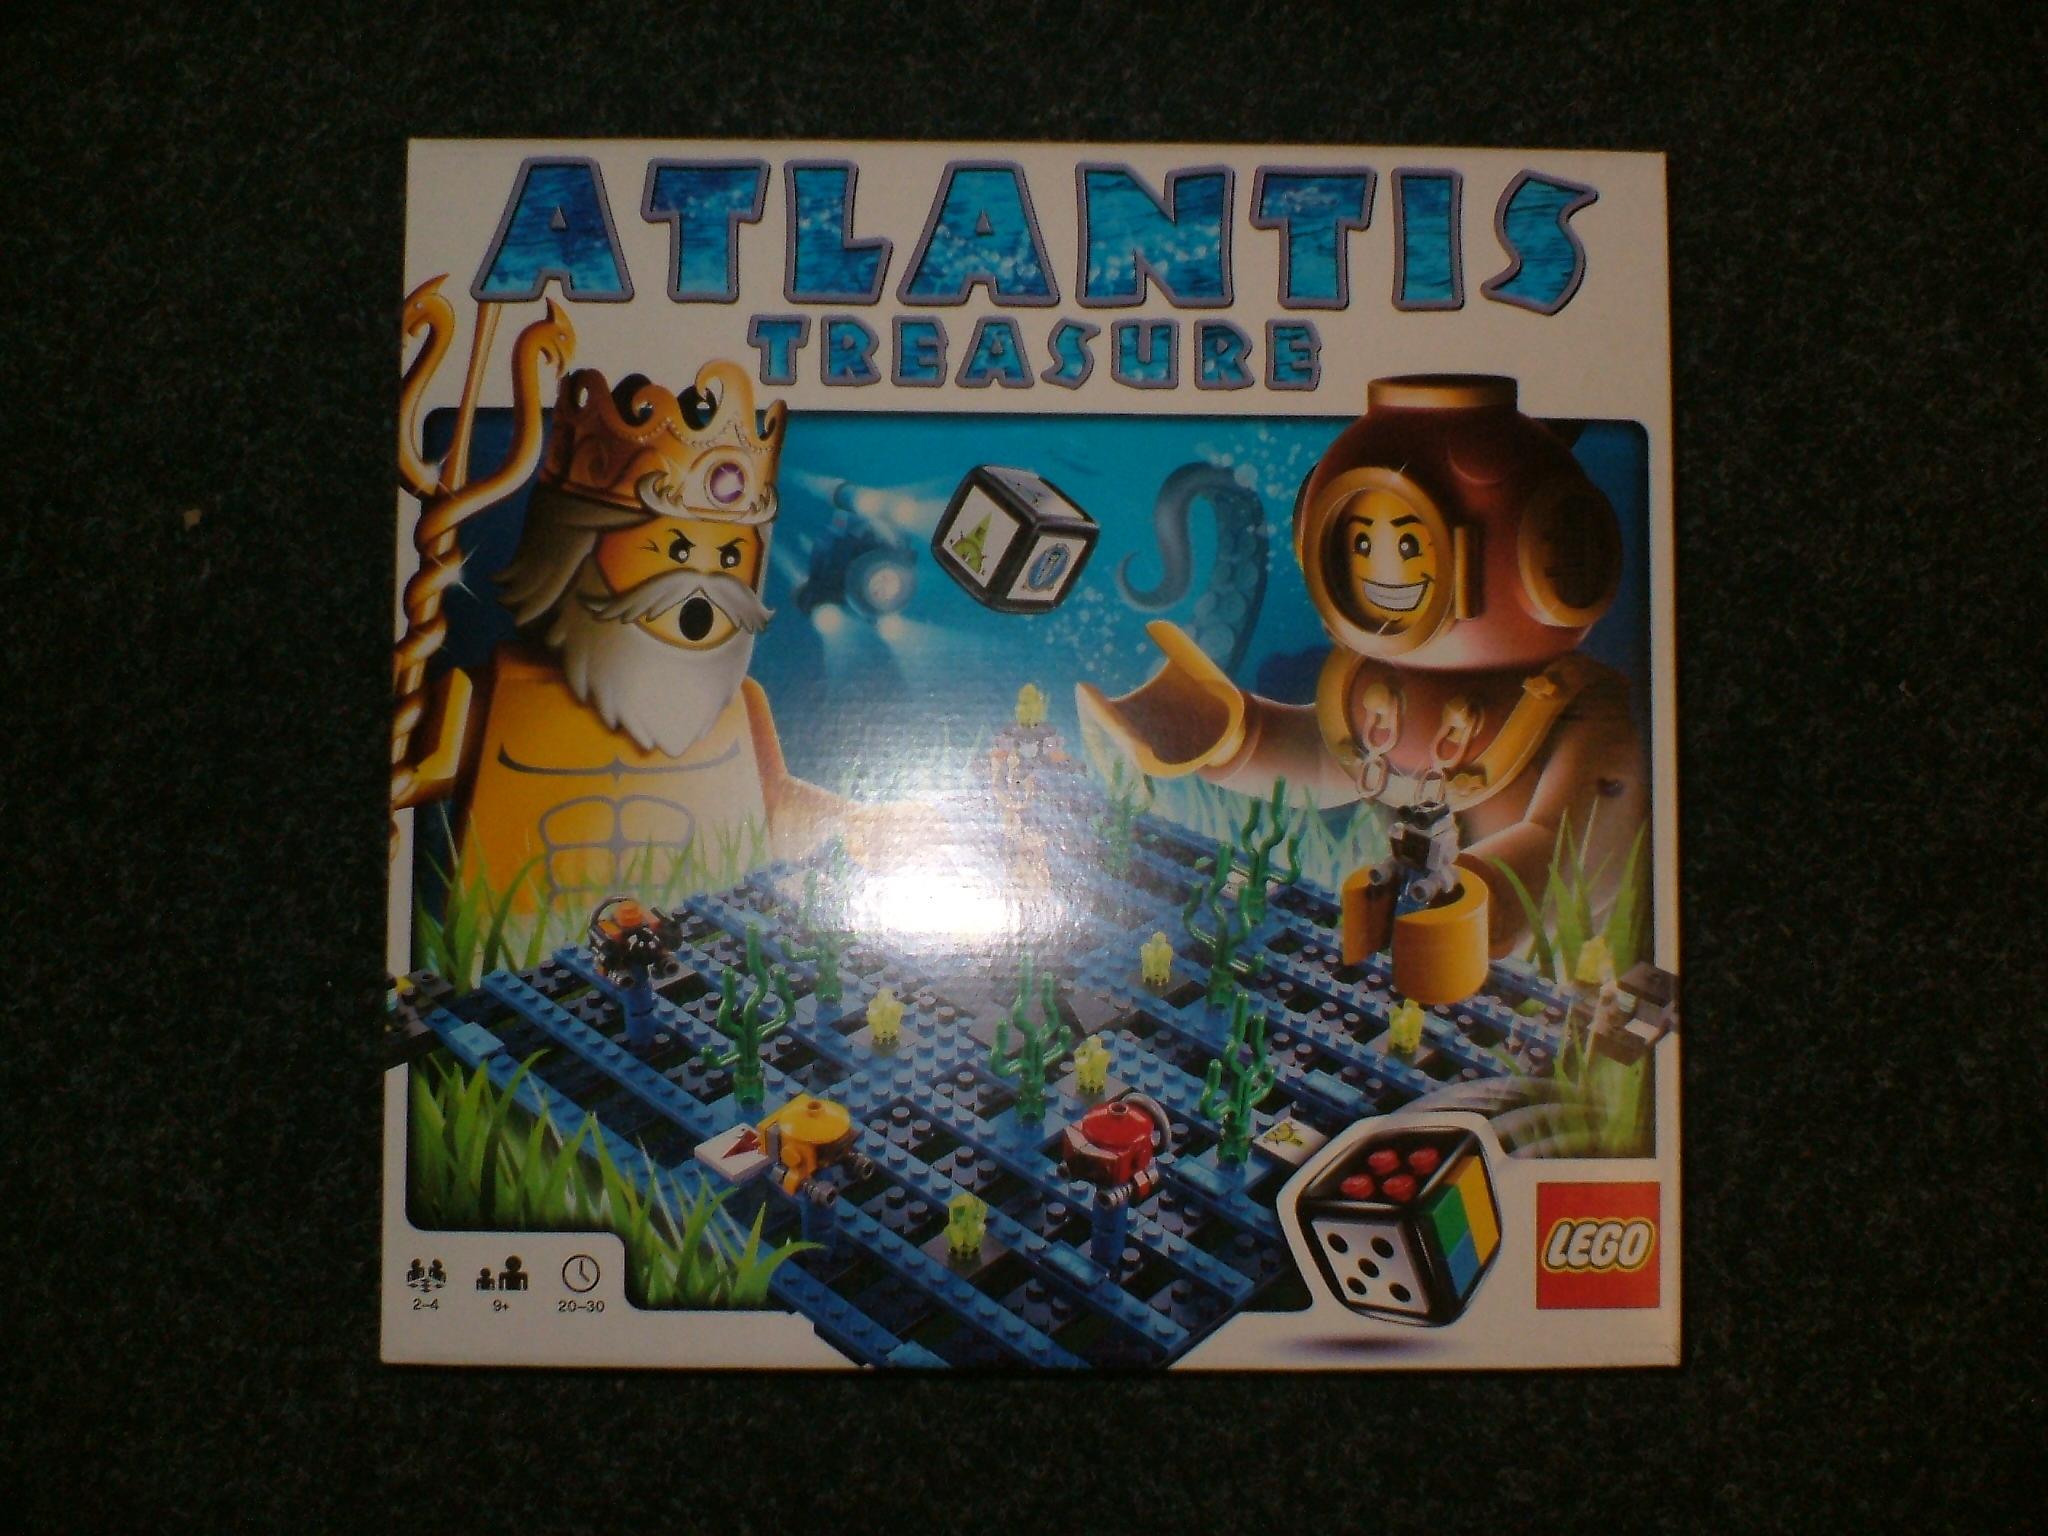 Lego 3851 Atlantis Treasure Board Game